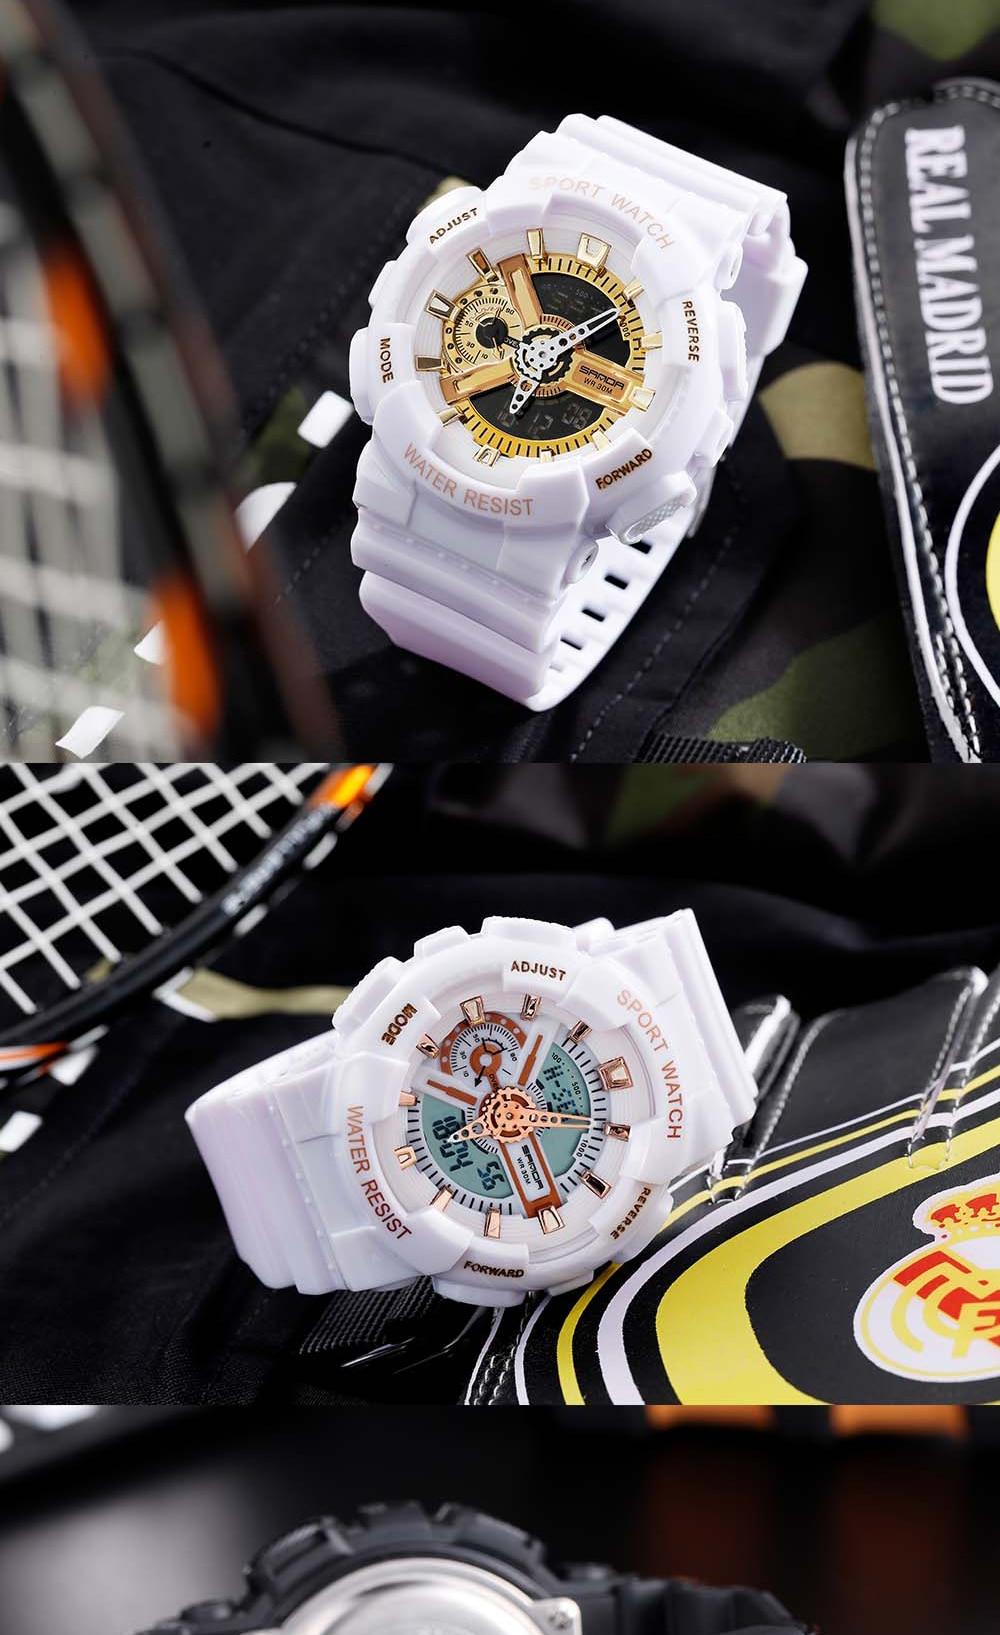 H20cca4db035c4fd0b4a16fc2e24eb1e9Y 2020 SANDA Military Men's Watch Brand Luxury Waterproof Sport Wristwatch Fashion Quartz Clock Couple Watch relogio masculino